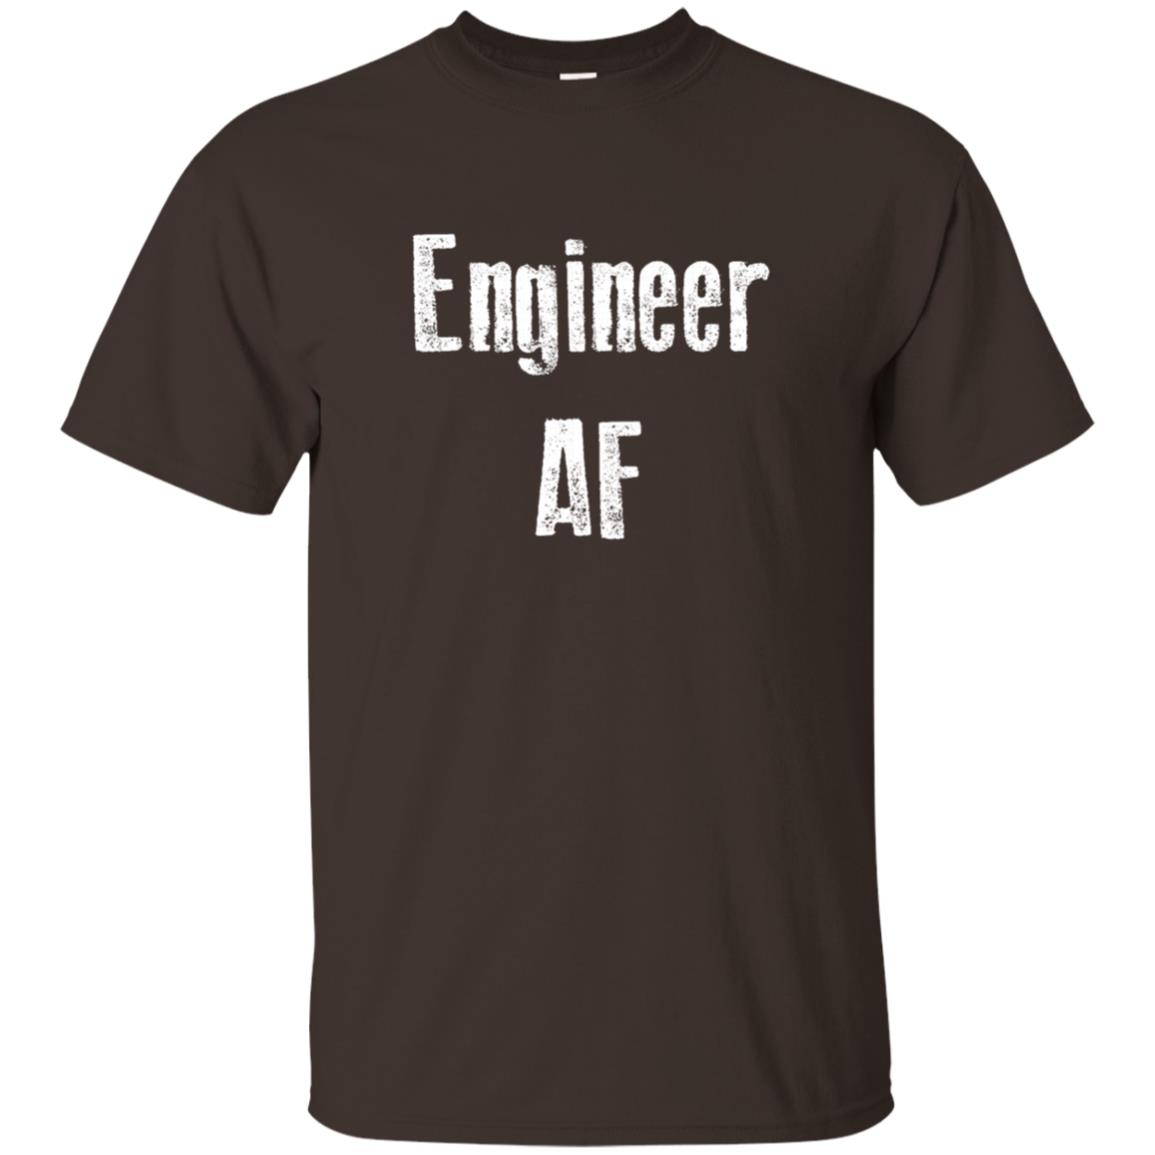 Engineer Af Funny Cute Gift Unisex Short Sleeve